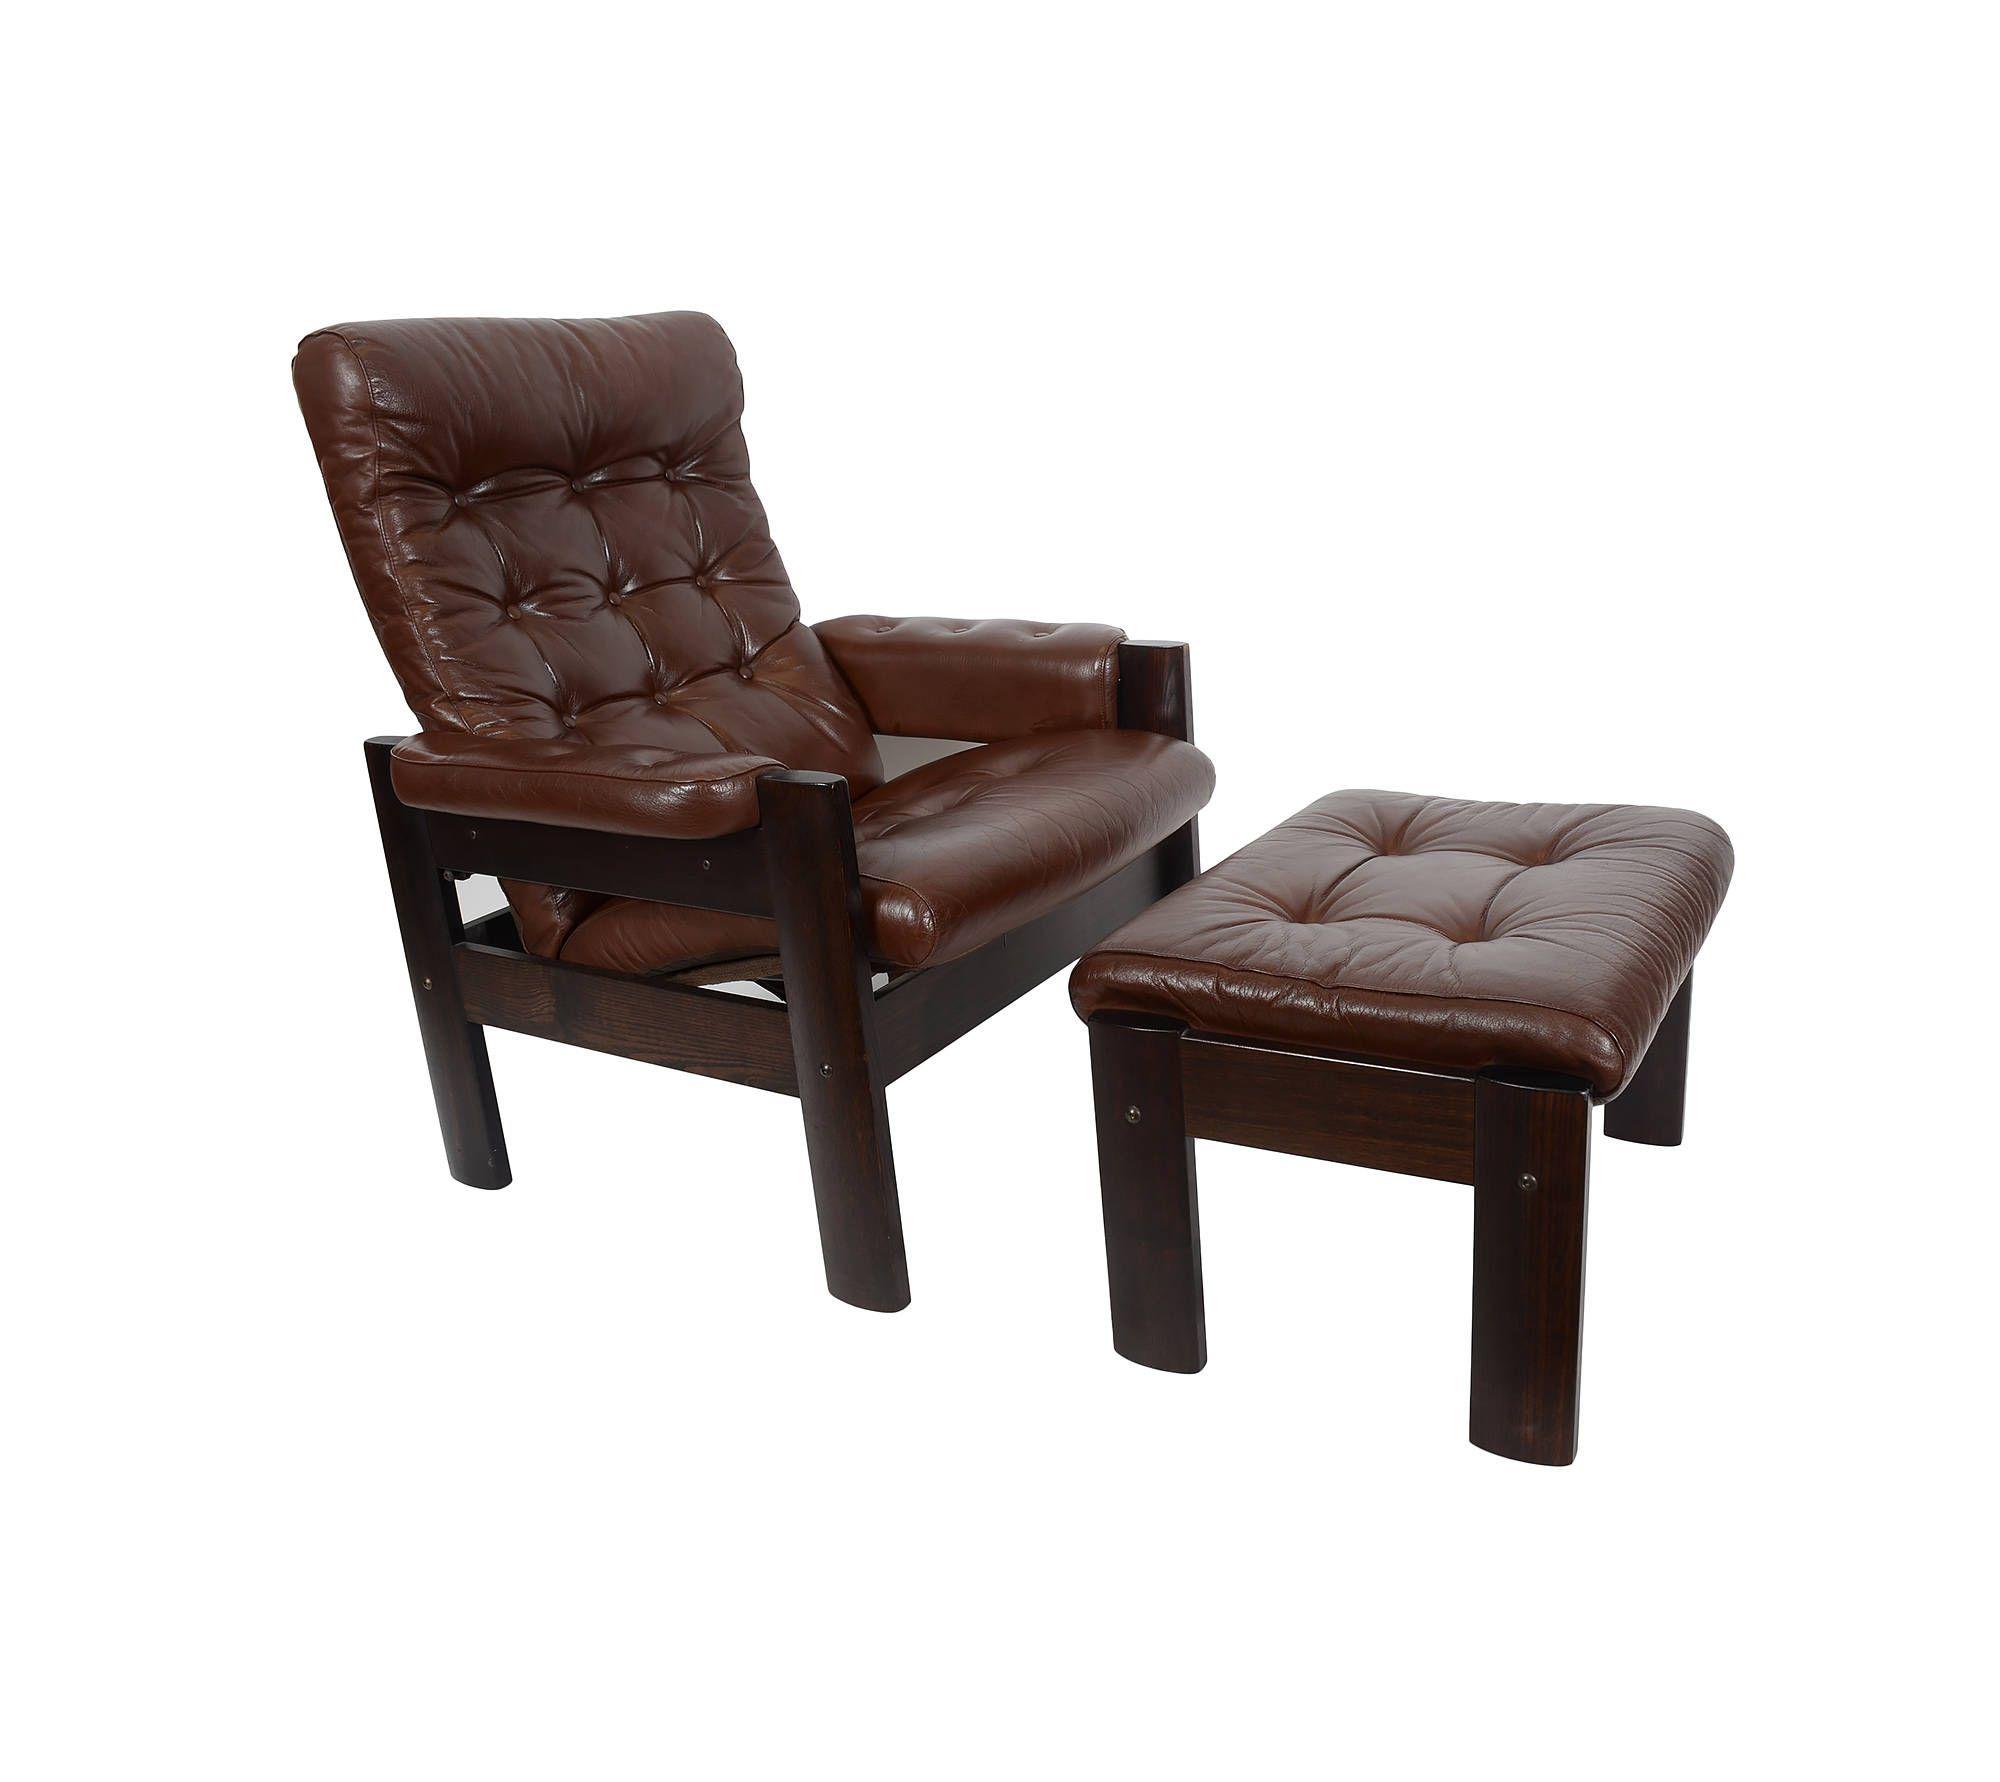 stressless chair similar and a half cover leather ekornes amigo reclining ottoman